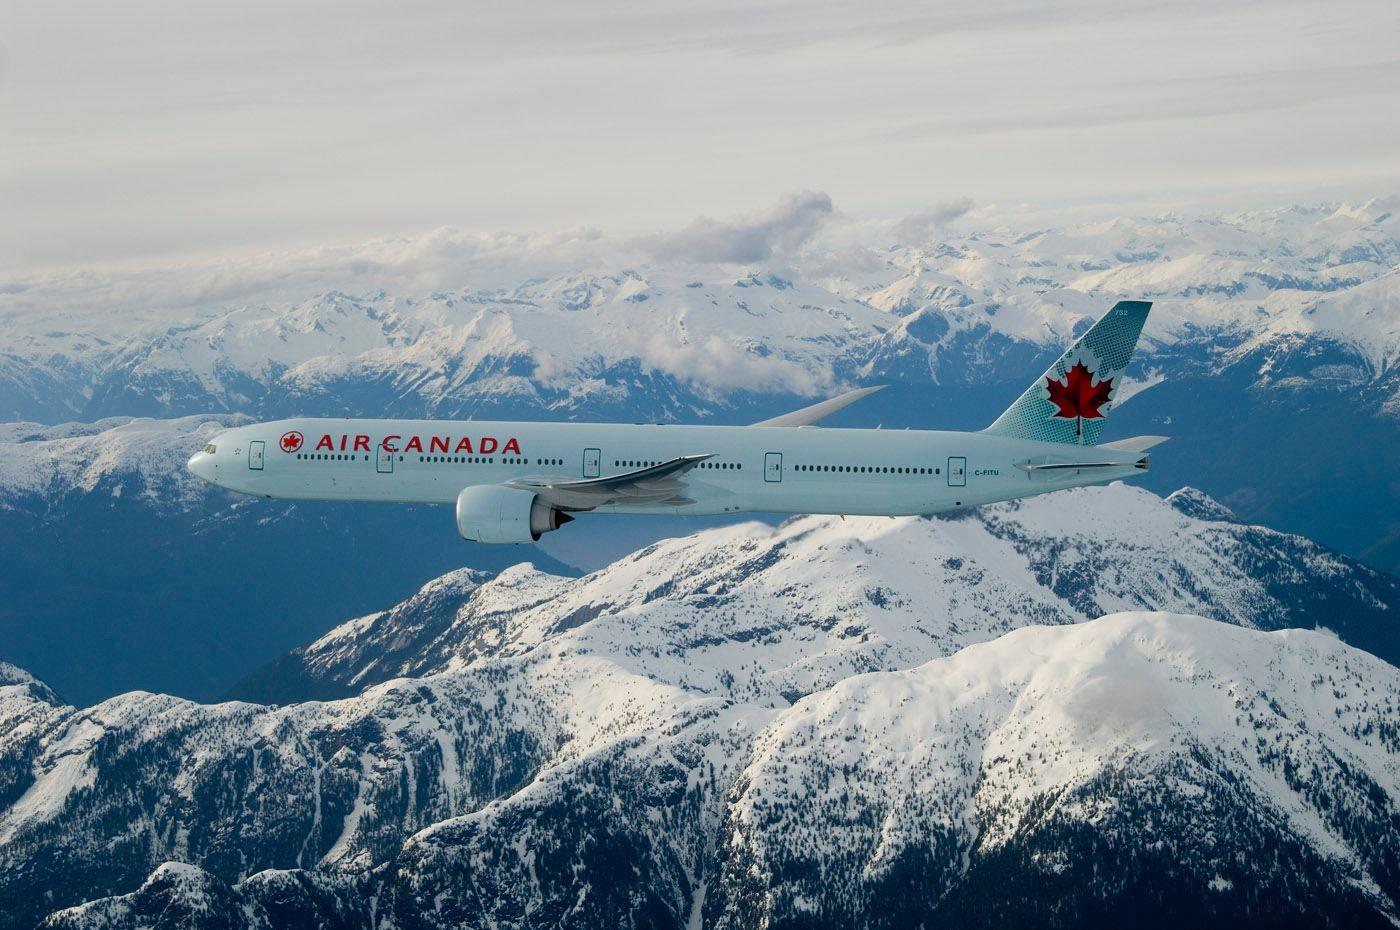 Boeing 777, Air Canada Airline of Canada Beautiful!!! 飛行機